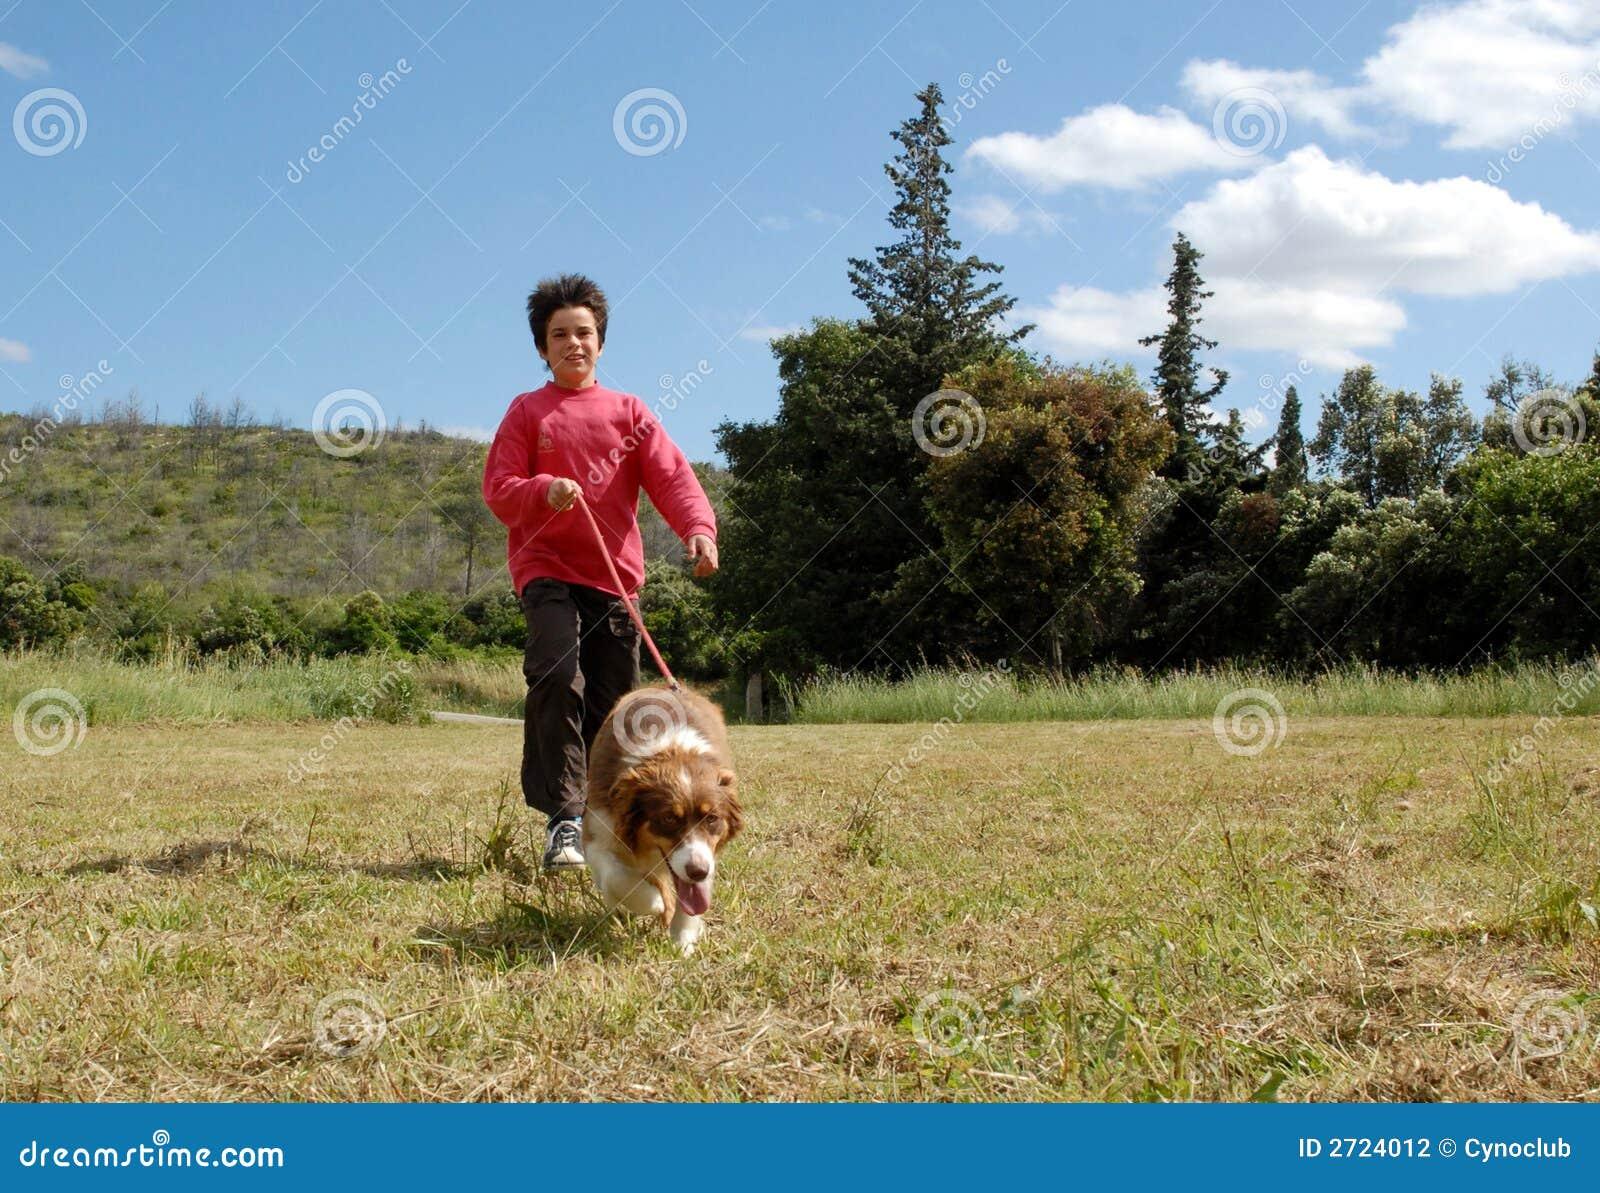 Child and australian dog